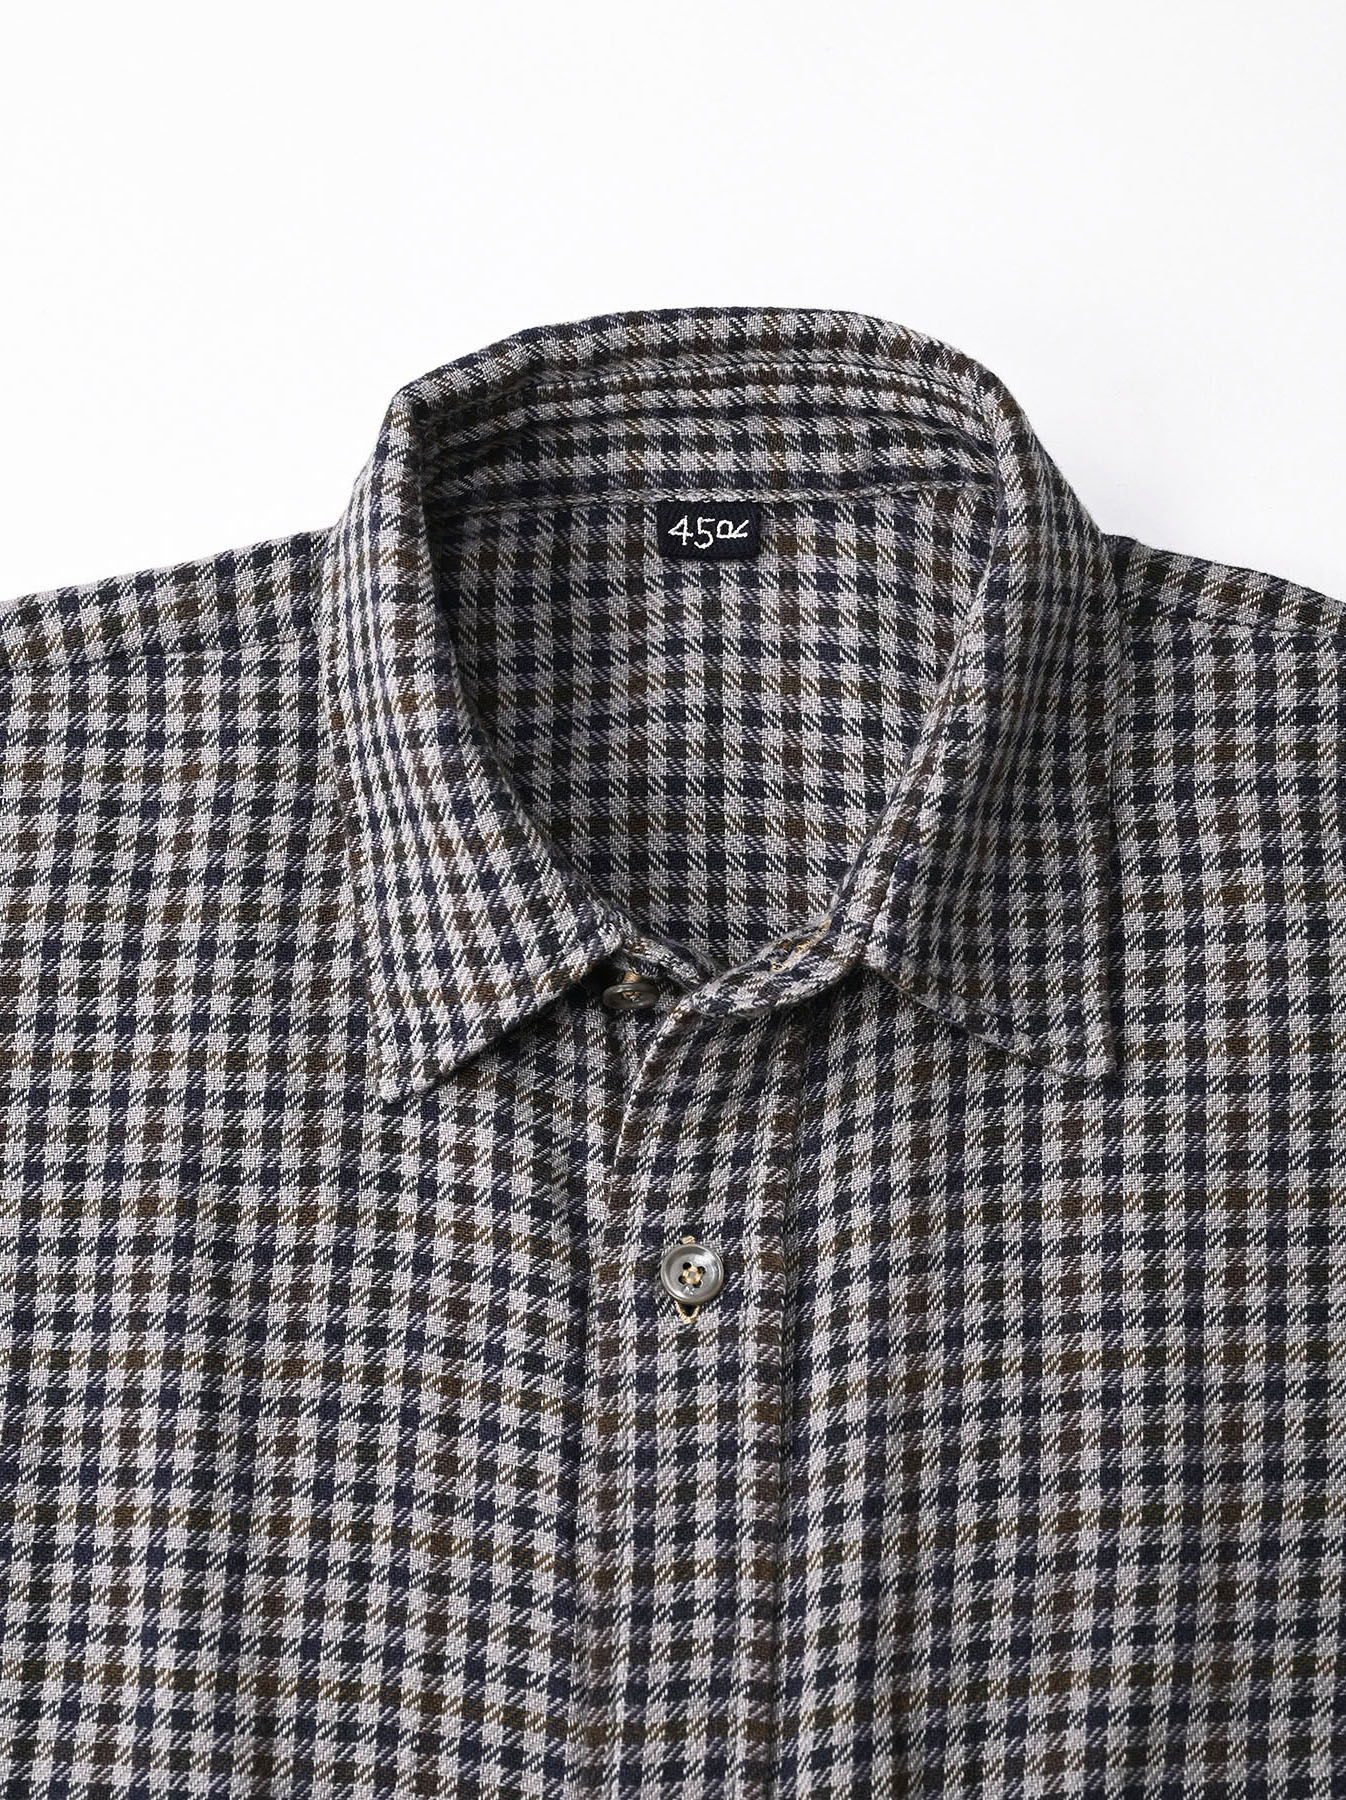 Indian Flannel Big Shirt Dress-6